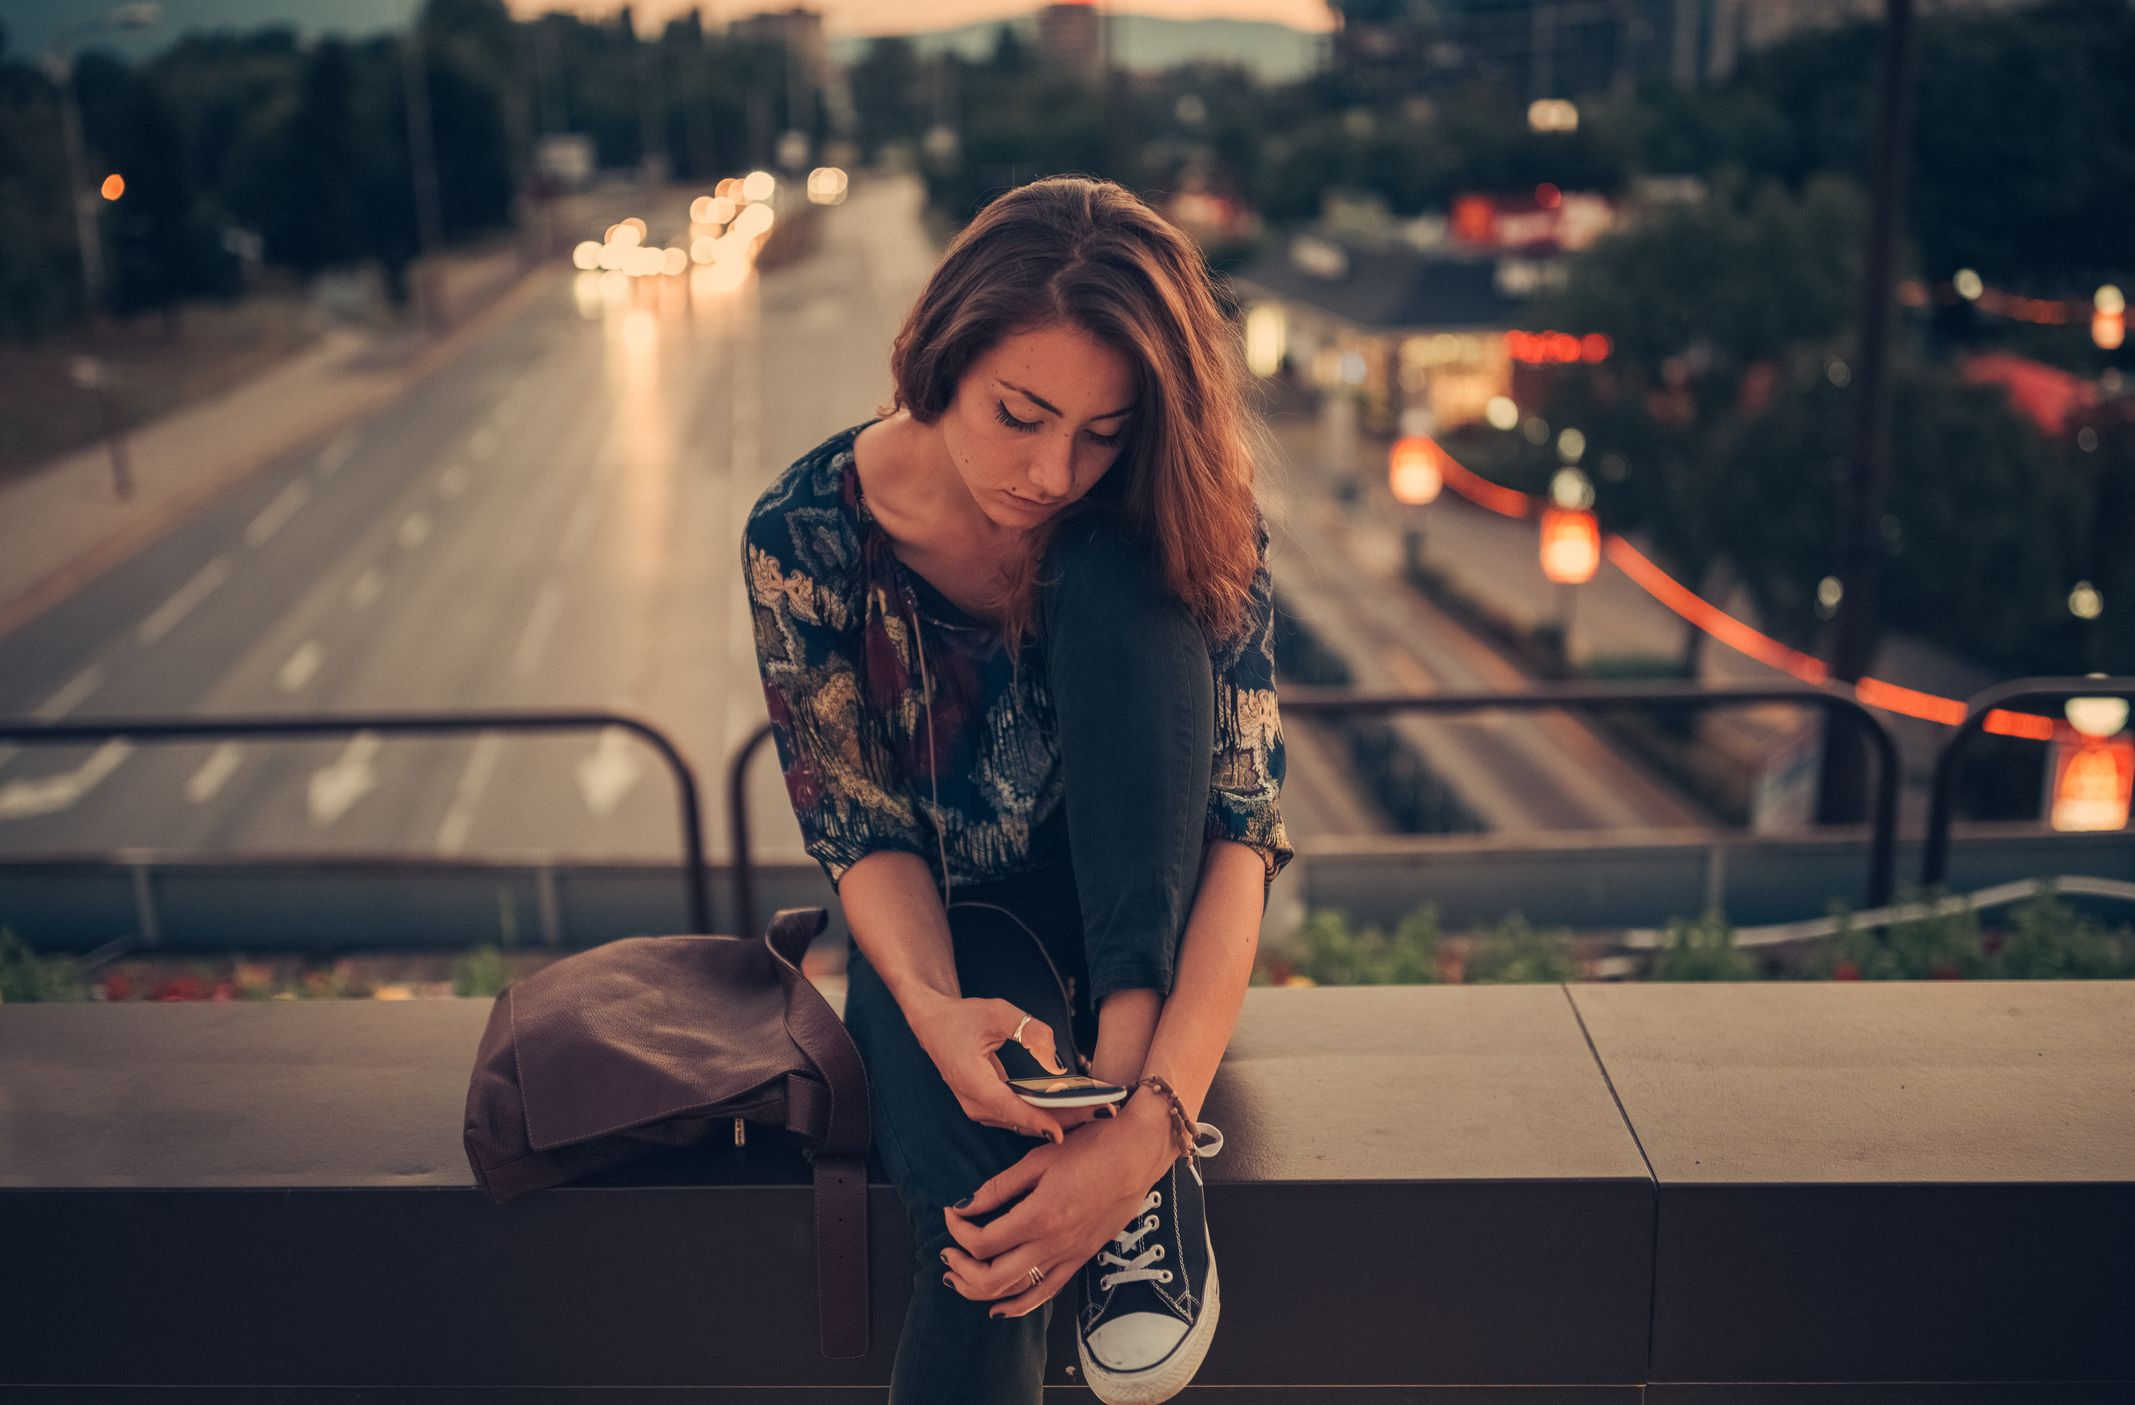 Depressed teenager texting